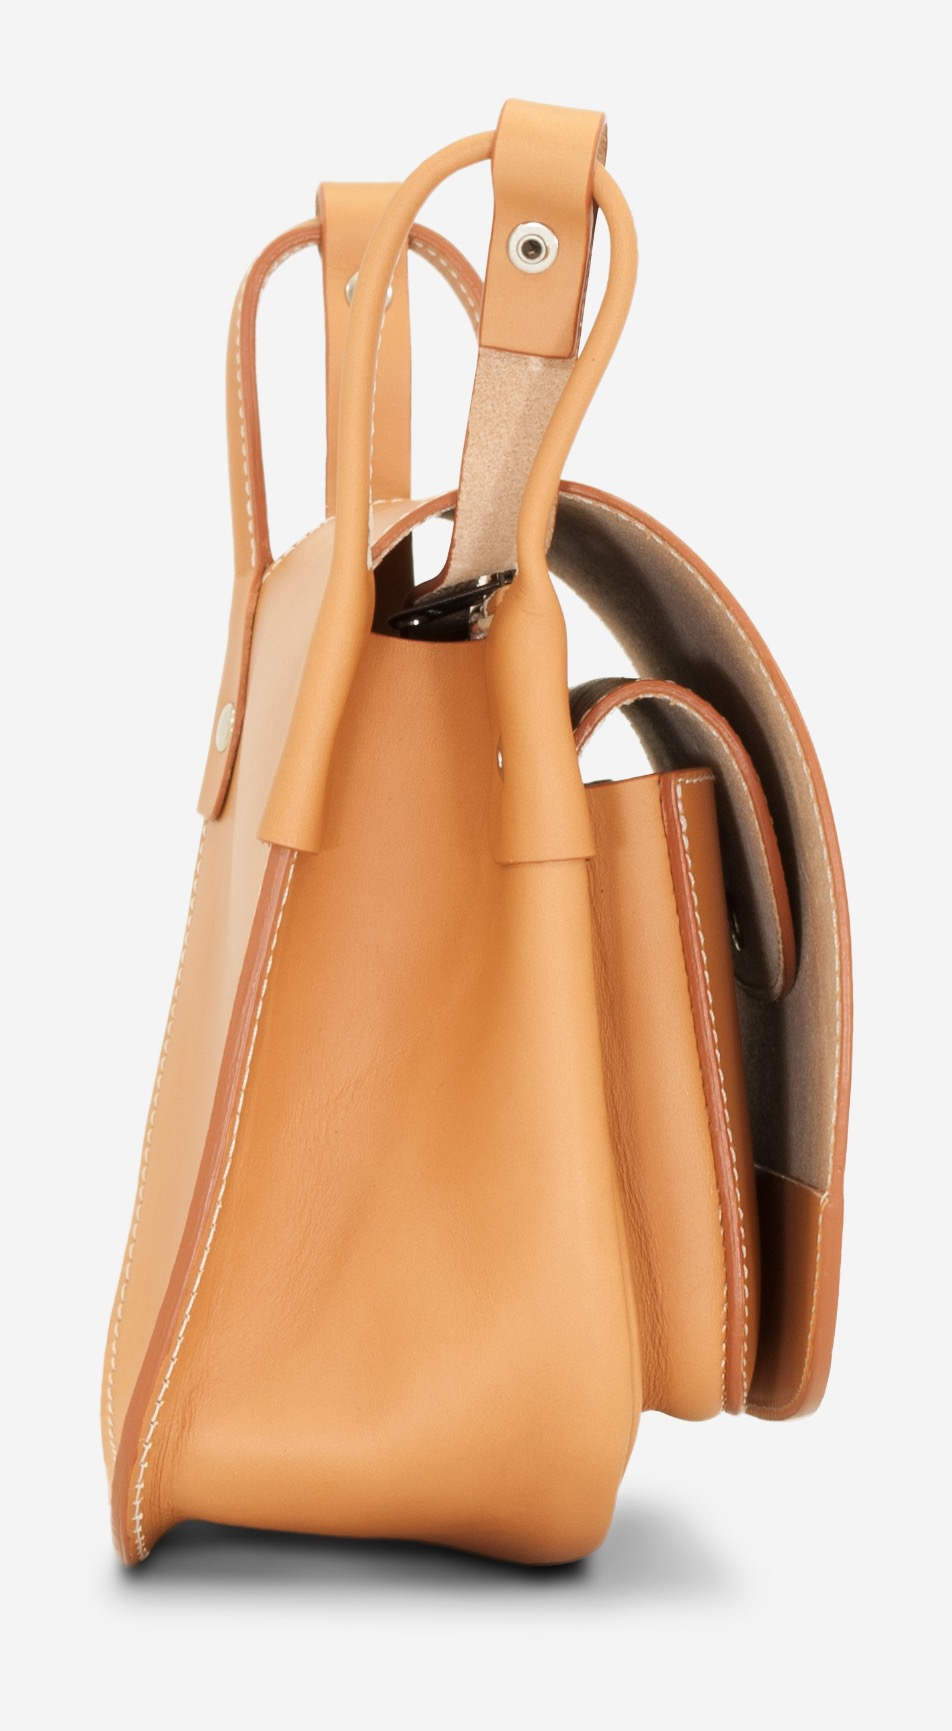 Side view of the elegant tan leather shoulder bag for women.